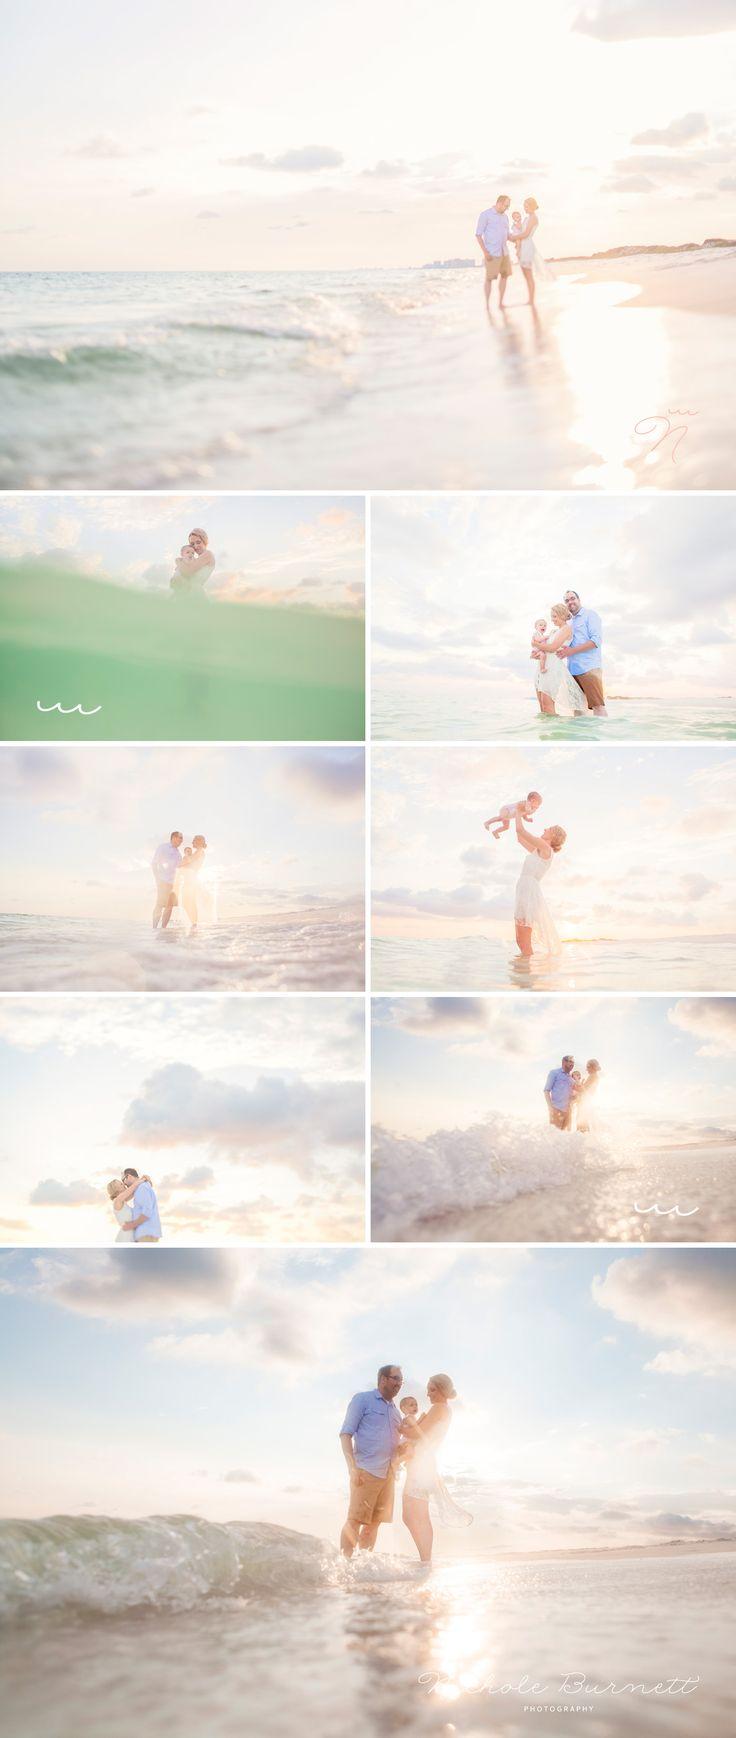 Beach Photographer in Santa Rosa Beach | Water and Light | Beach Photo Inspiration| Family Posing| Dreamy beach photos |Candid Family Beach Session © Nichole Burnett Photography